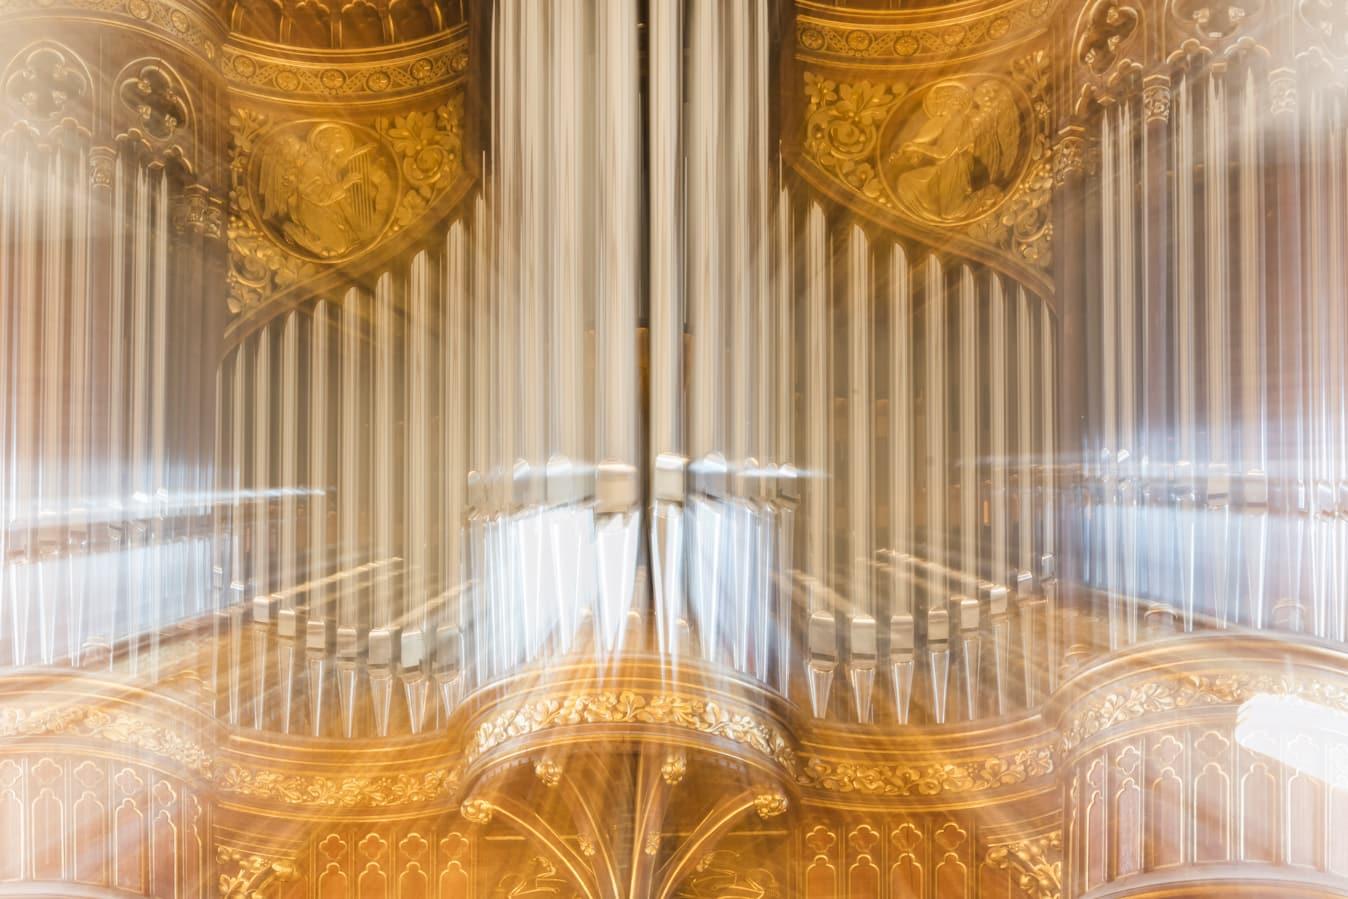 Kirche St. Johannis Harvestehude, Hamburg – Gottes Schwäche